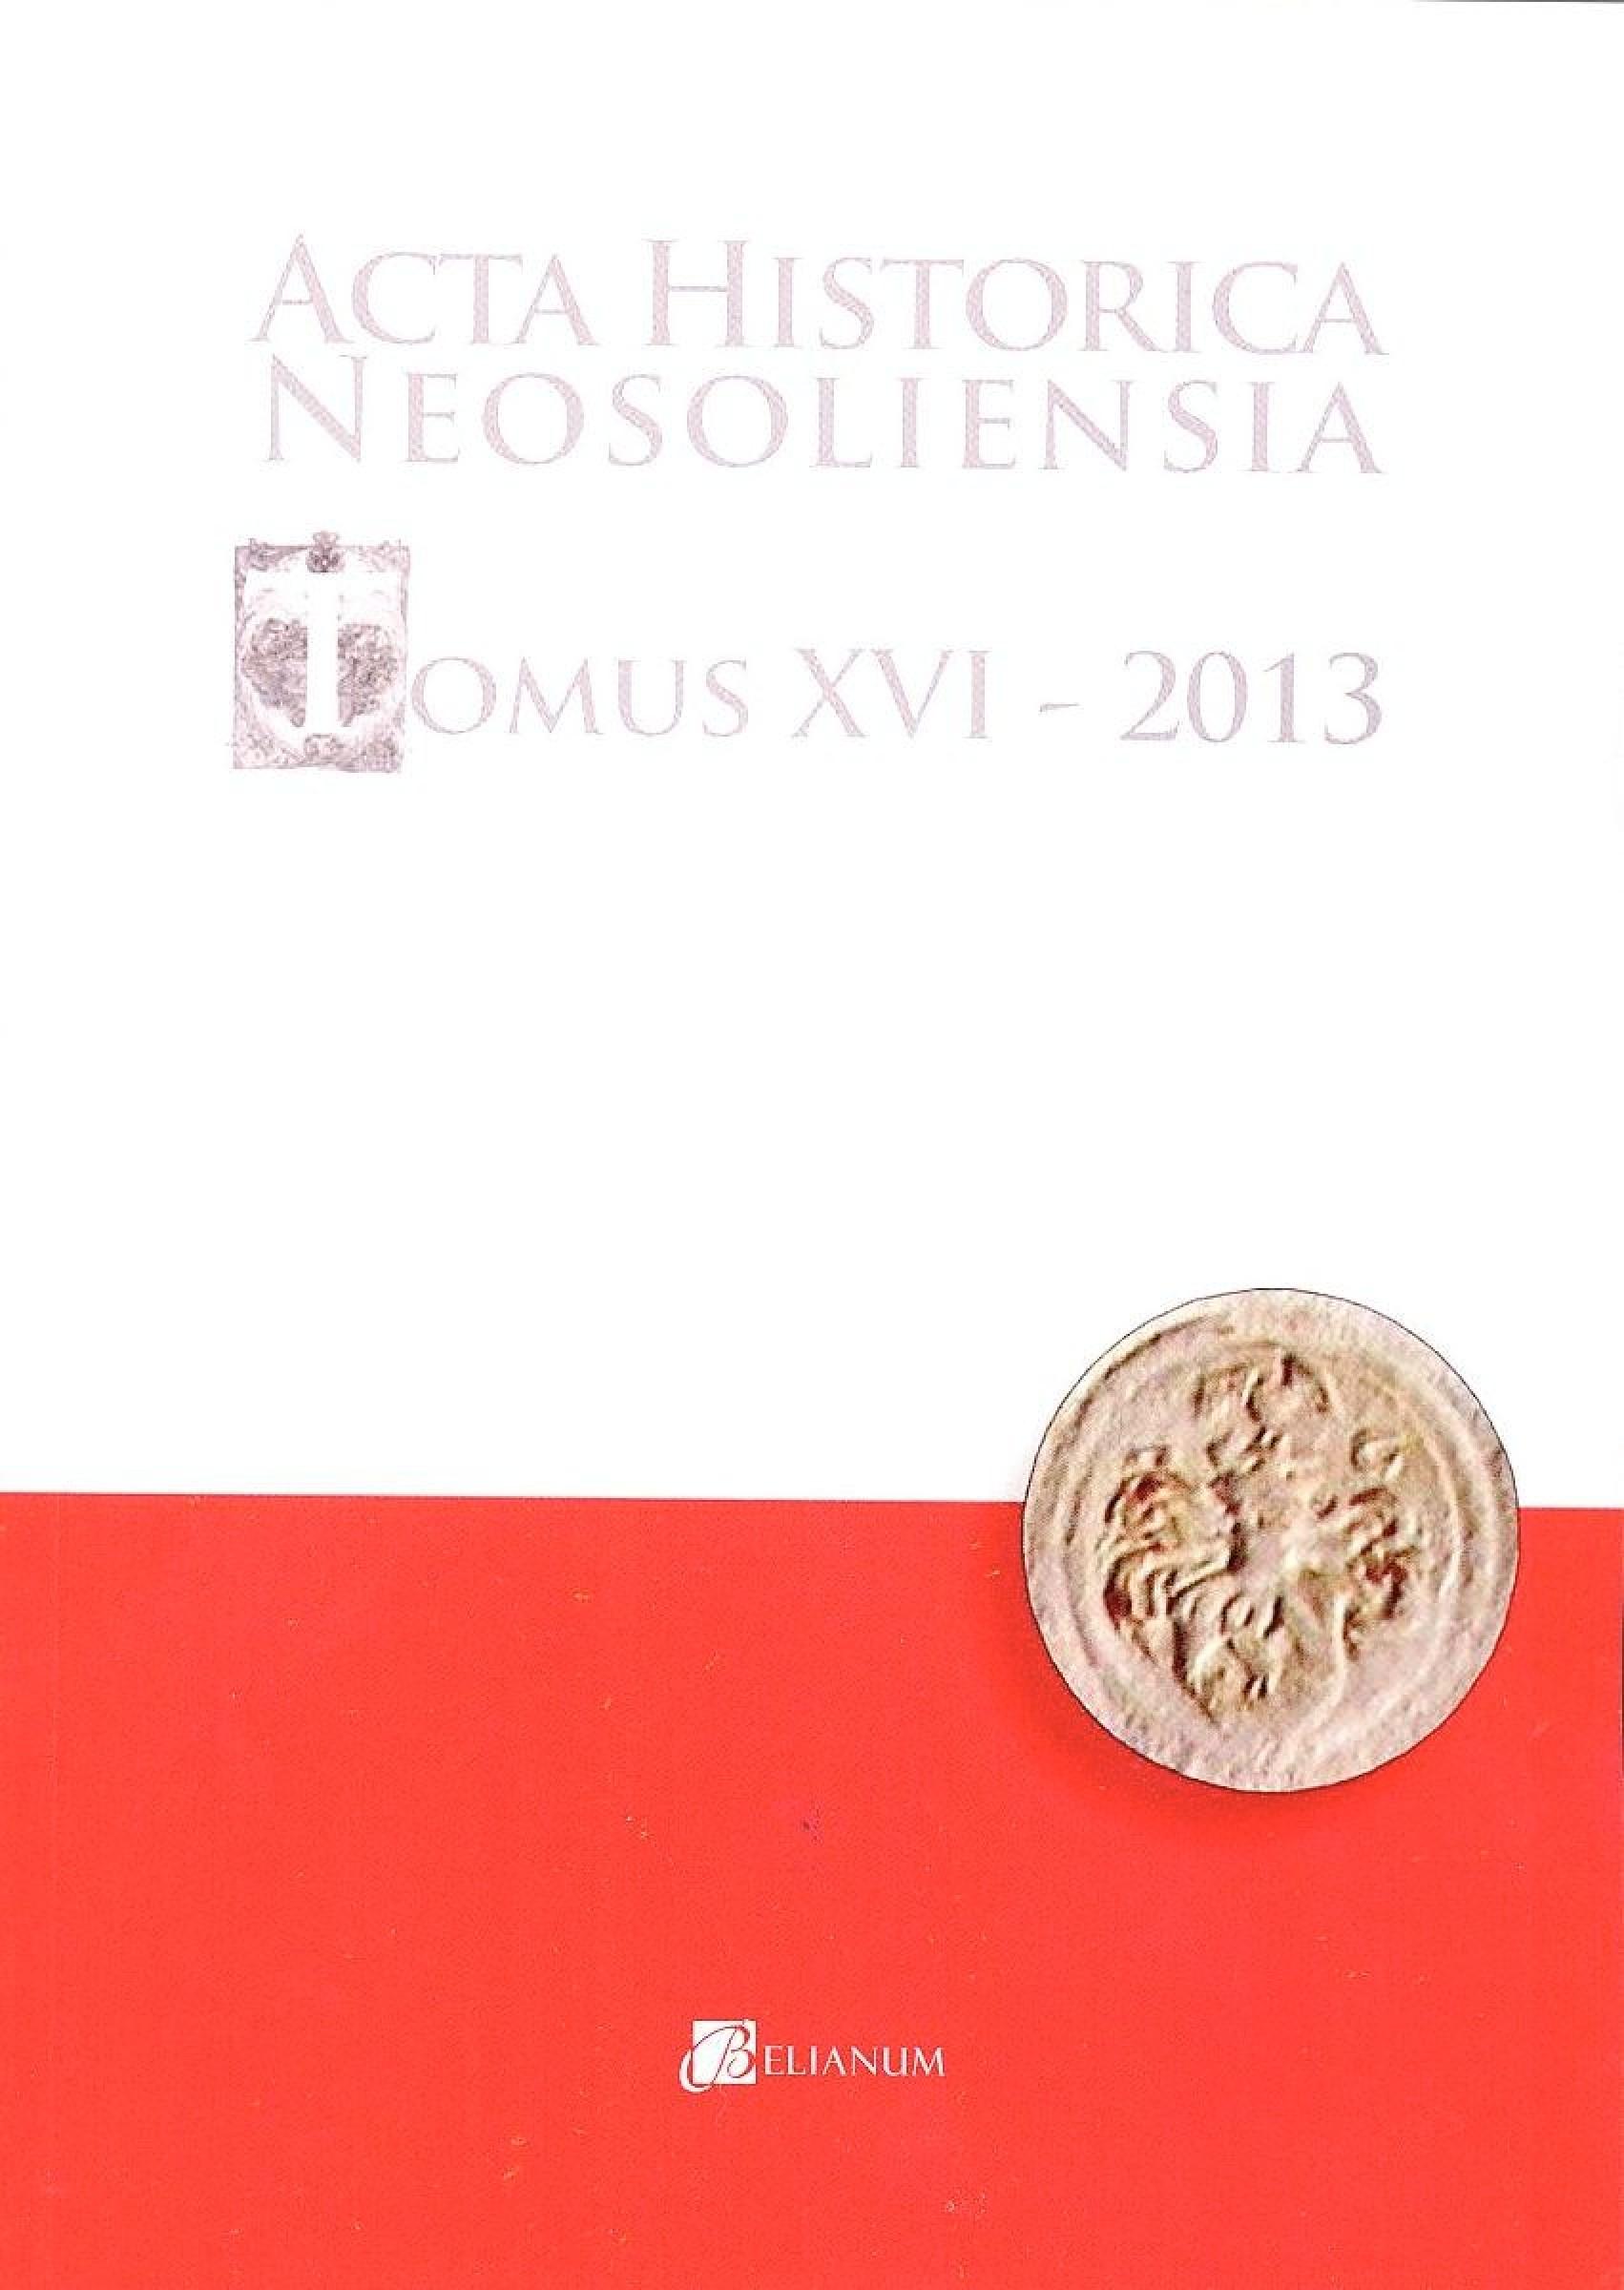 Acta historica nesoliensia, Tomus XVI - 2013, Vol. 1 - 2